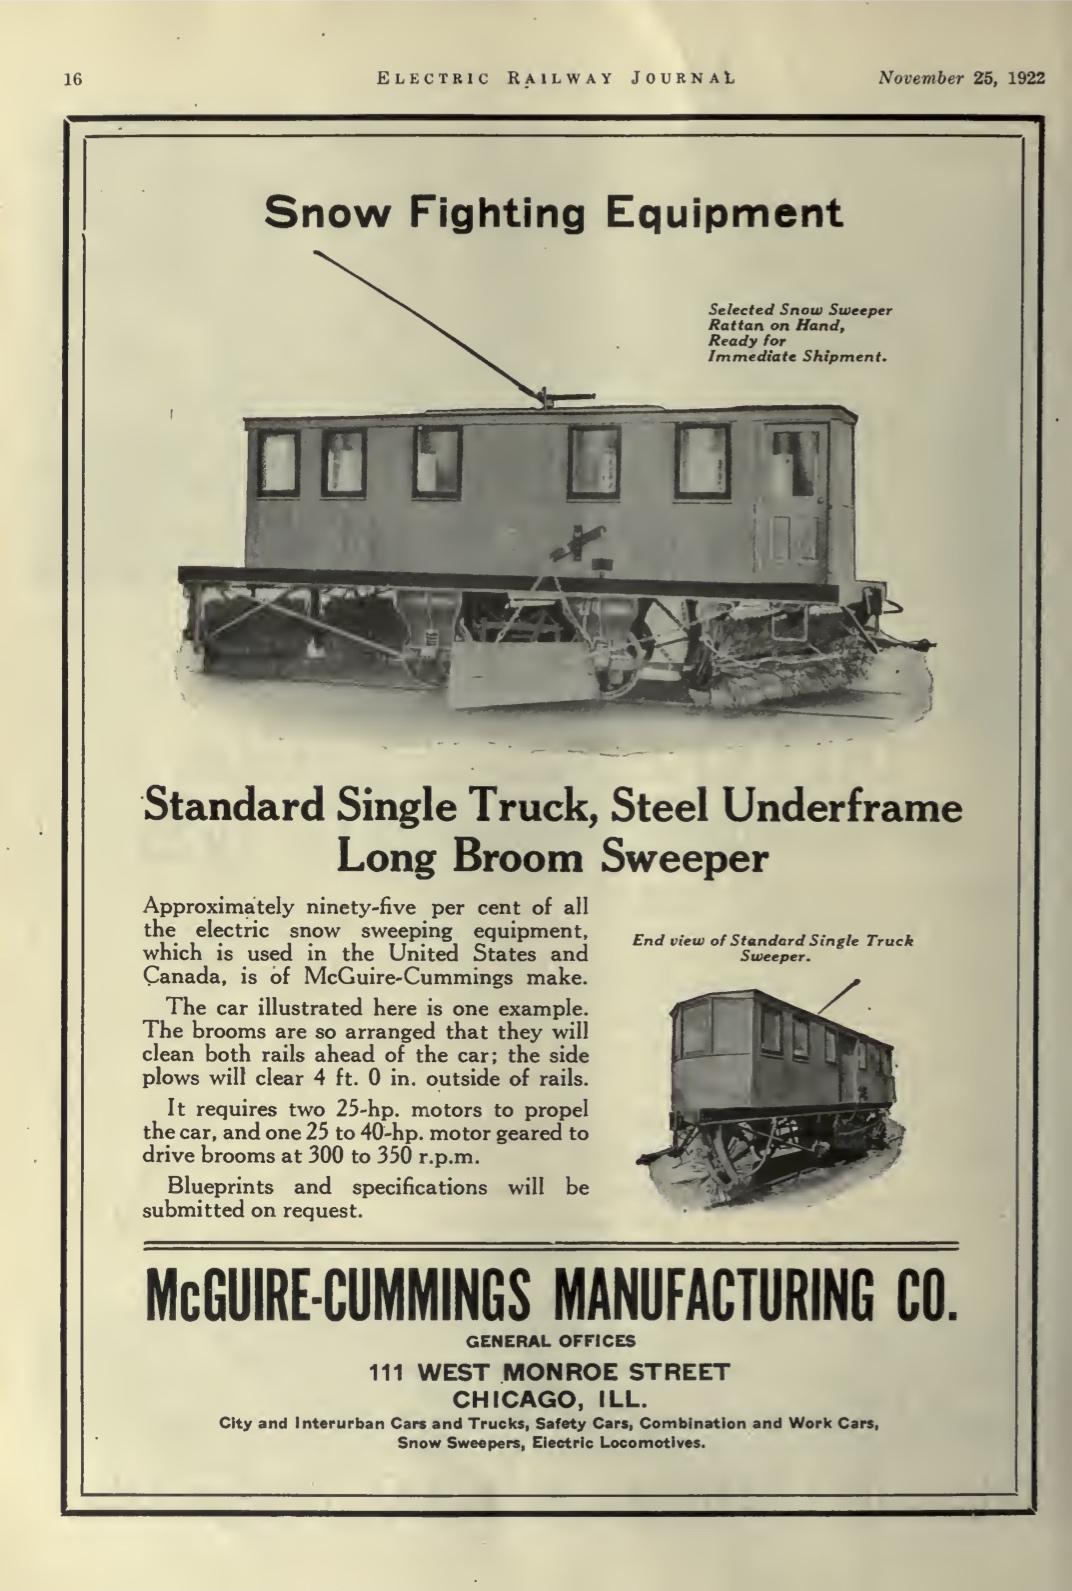 McGuire-Cummings Manufacturing Company - Wikipedia